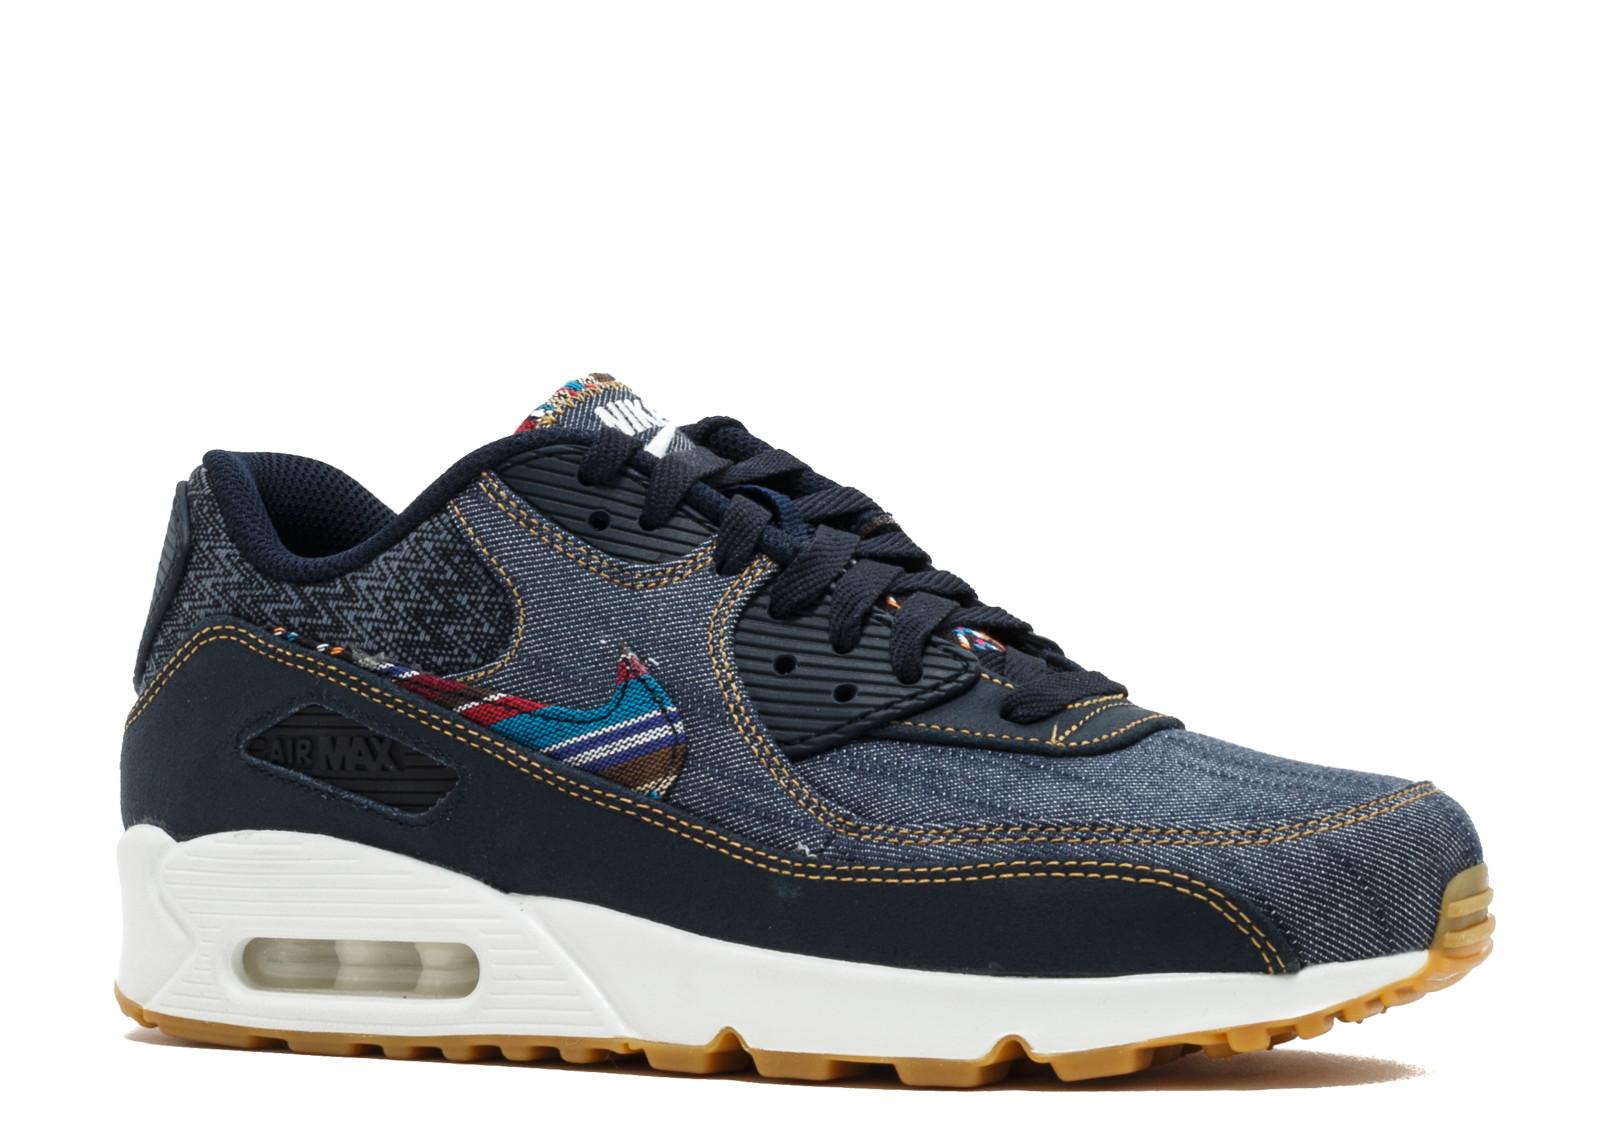 on sale 908b9 2e77c Kick Avenue - Authentic Sneakers